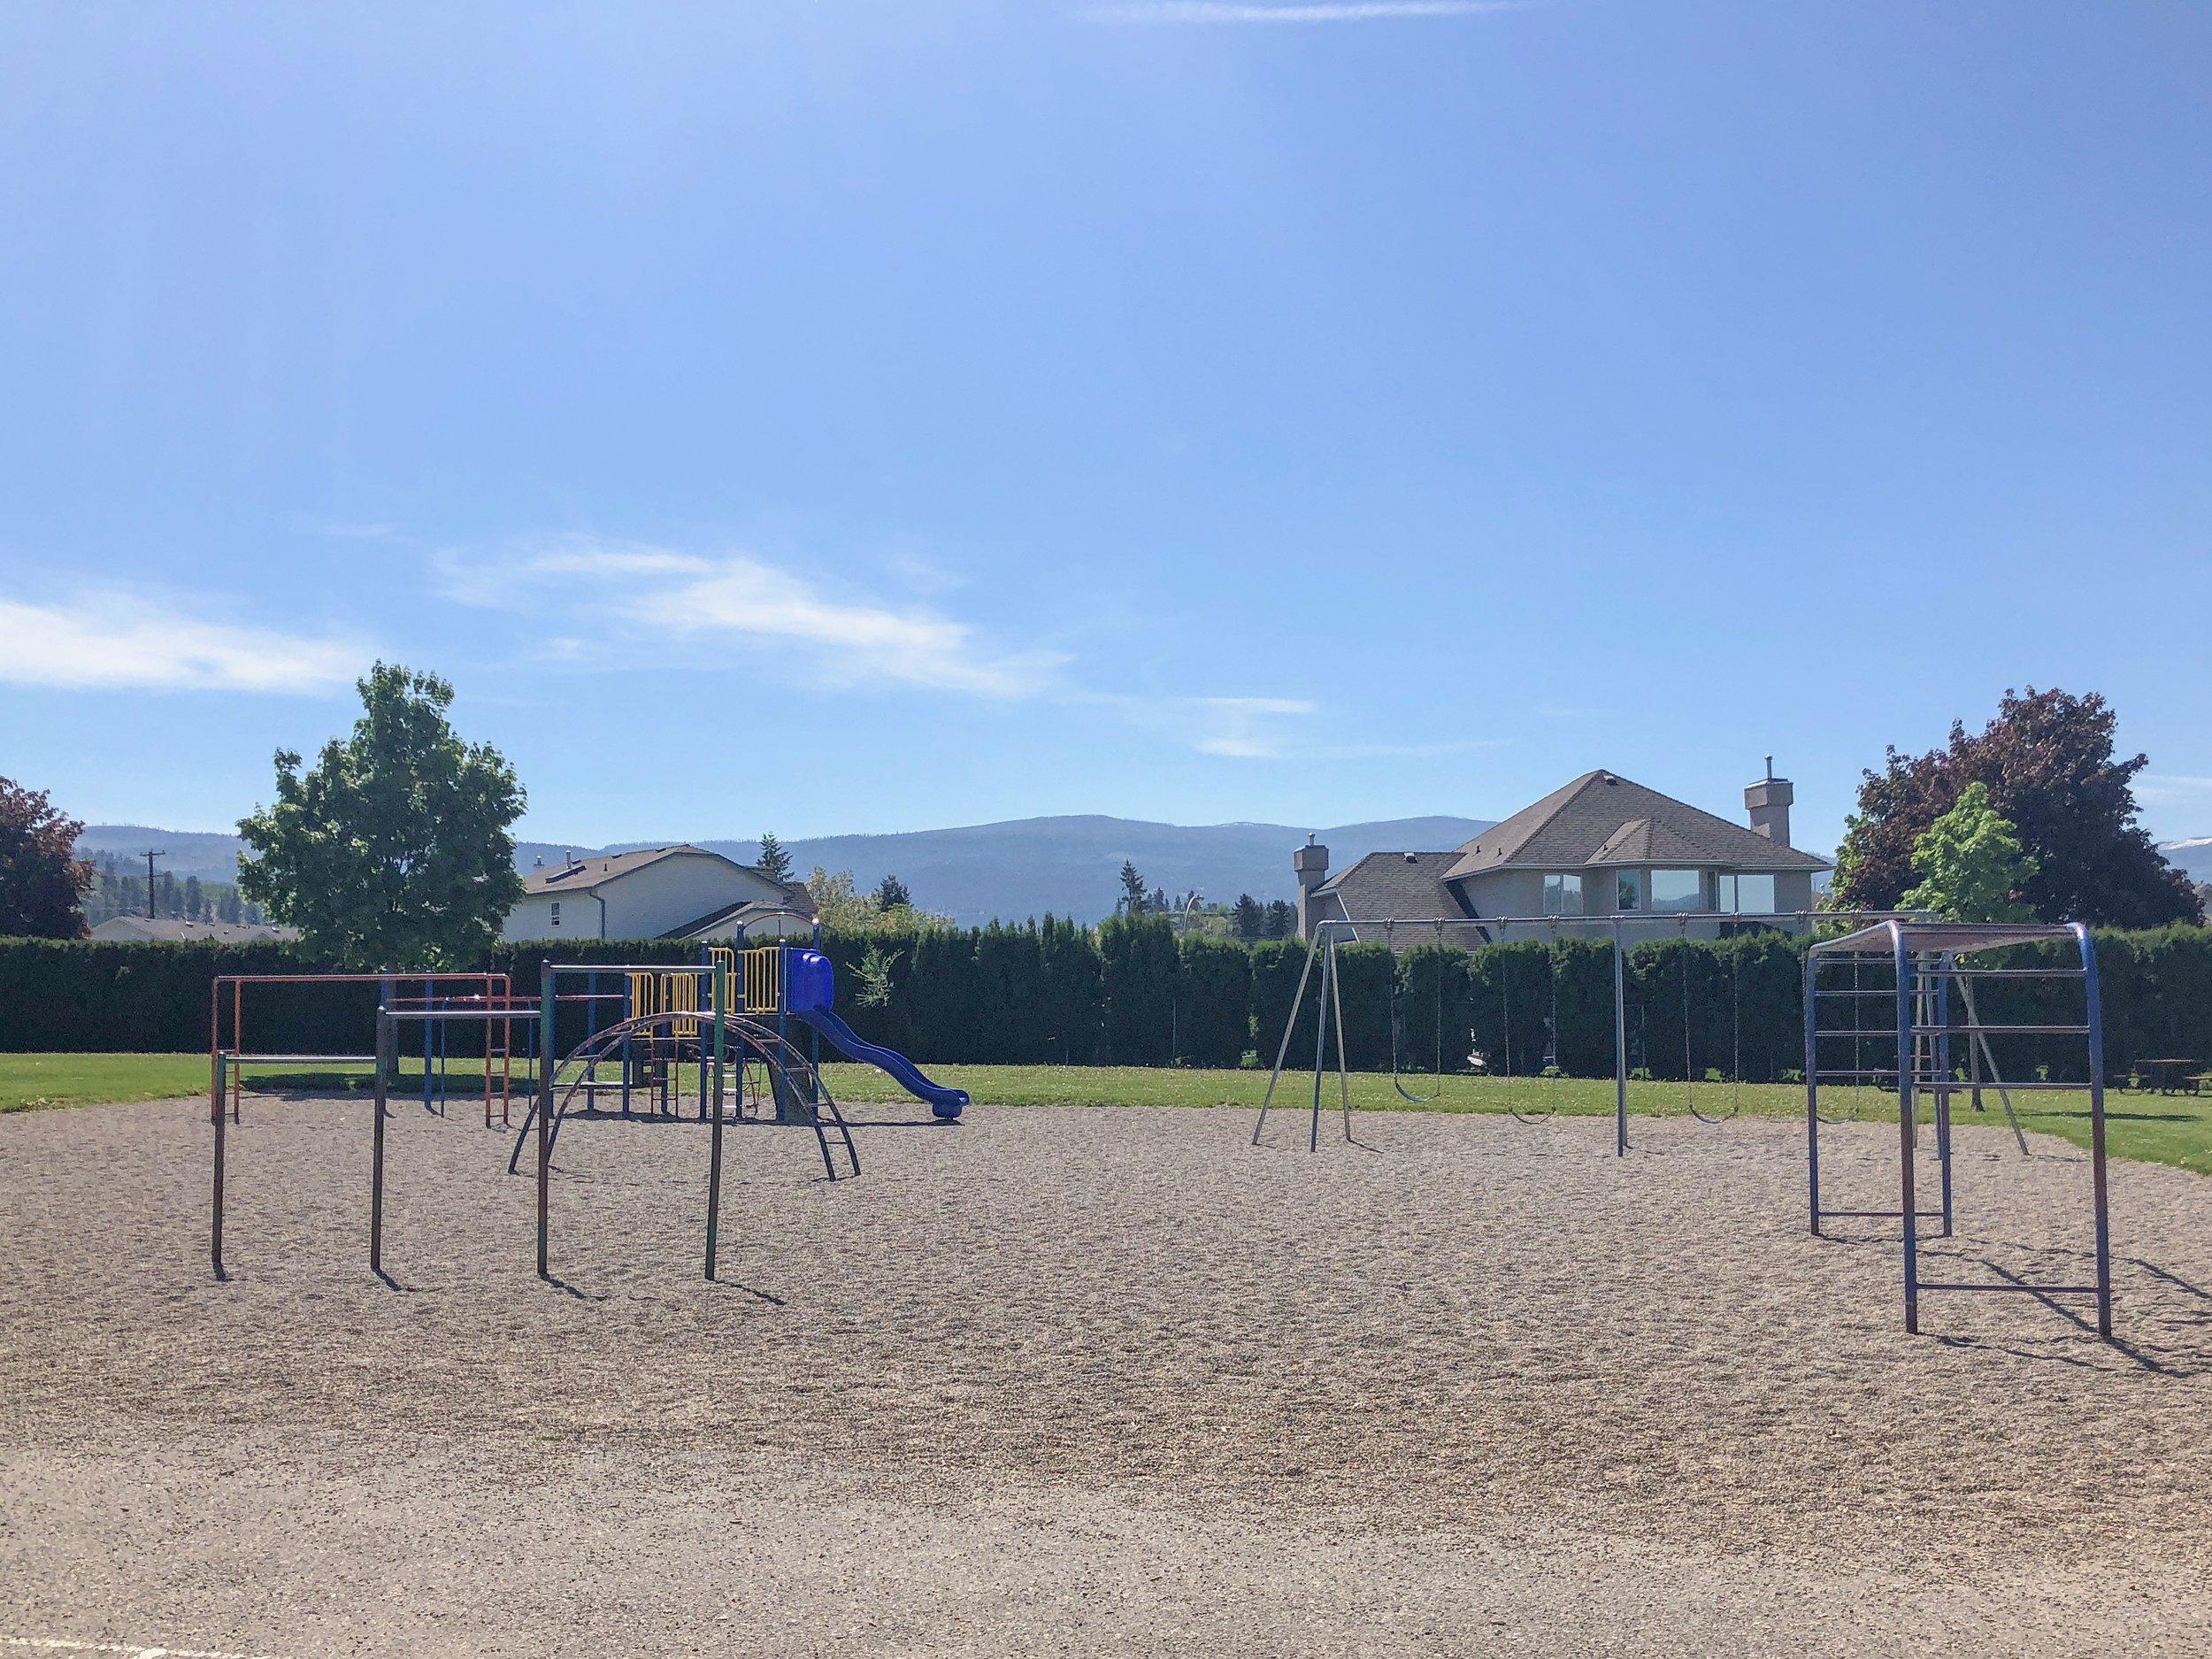 quigley-elementary-school-kelowna-rutland-neighbourhood-joshua-elliott-03.JPG